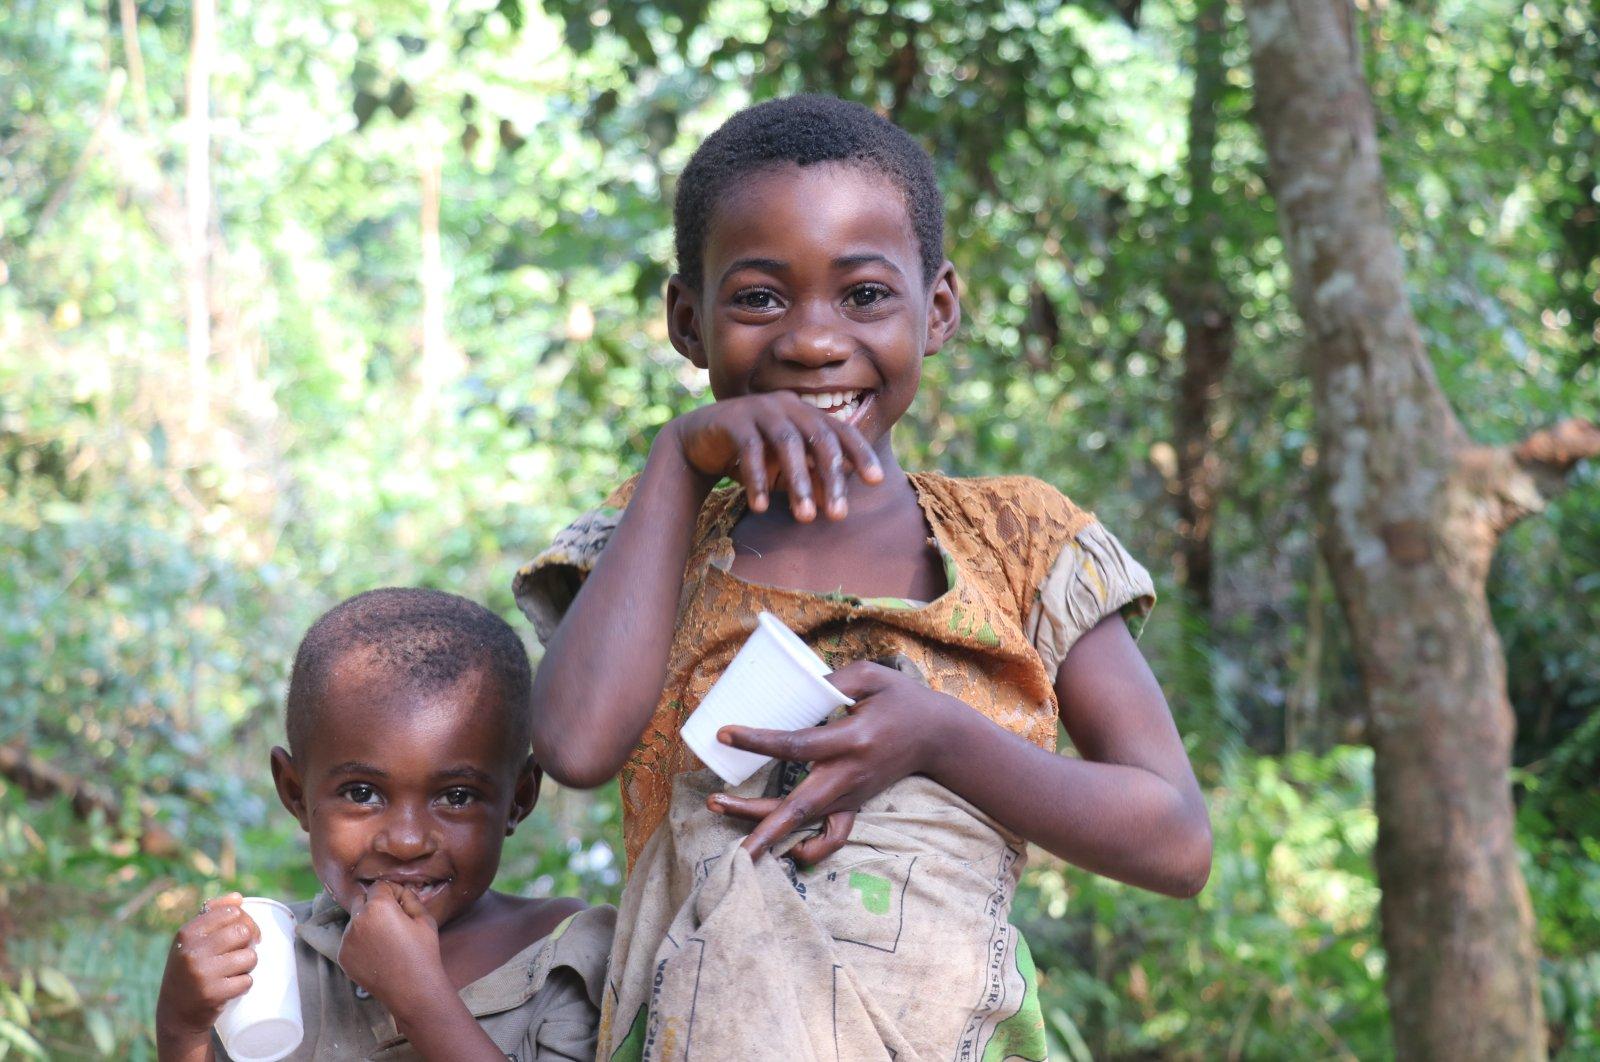 Pygmy children smile in Bikuitsi-Njule, Cameroon, Aug. 2, 2021. (AA Photo)